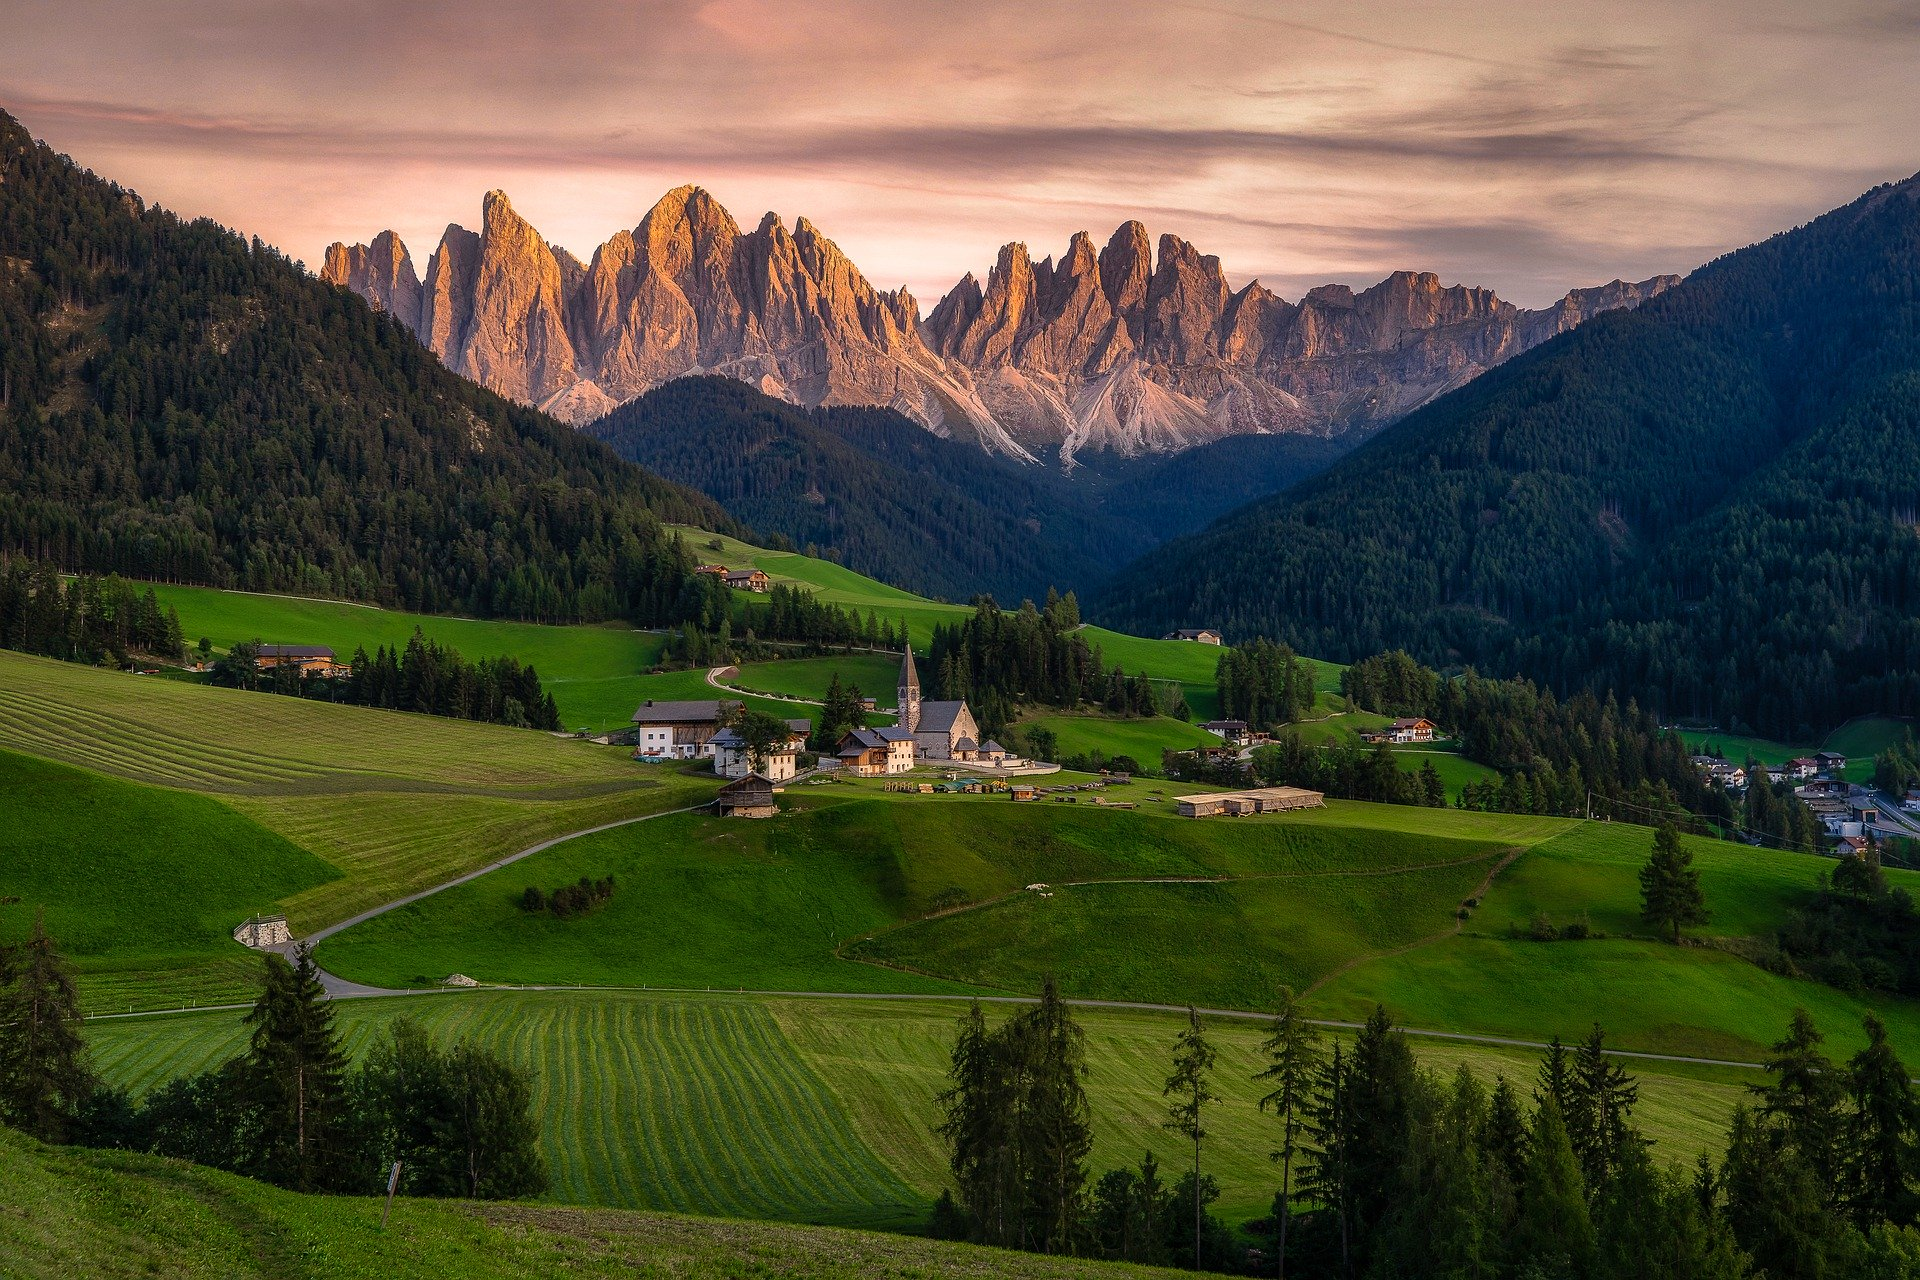 Italien har billedskøn natur